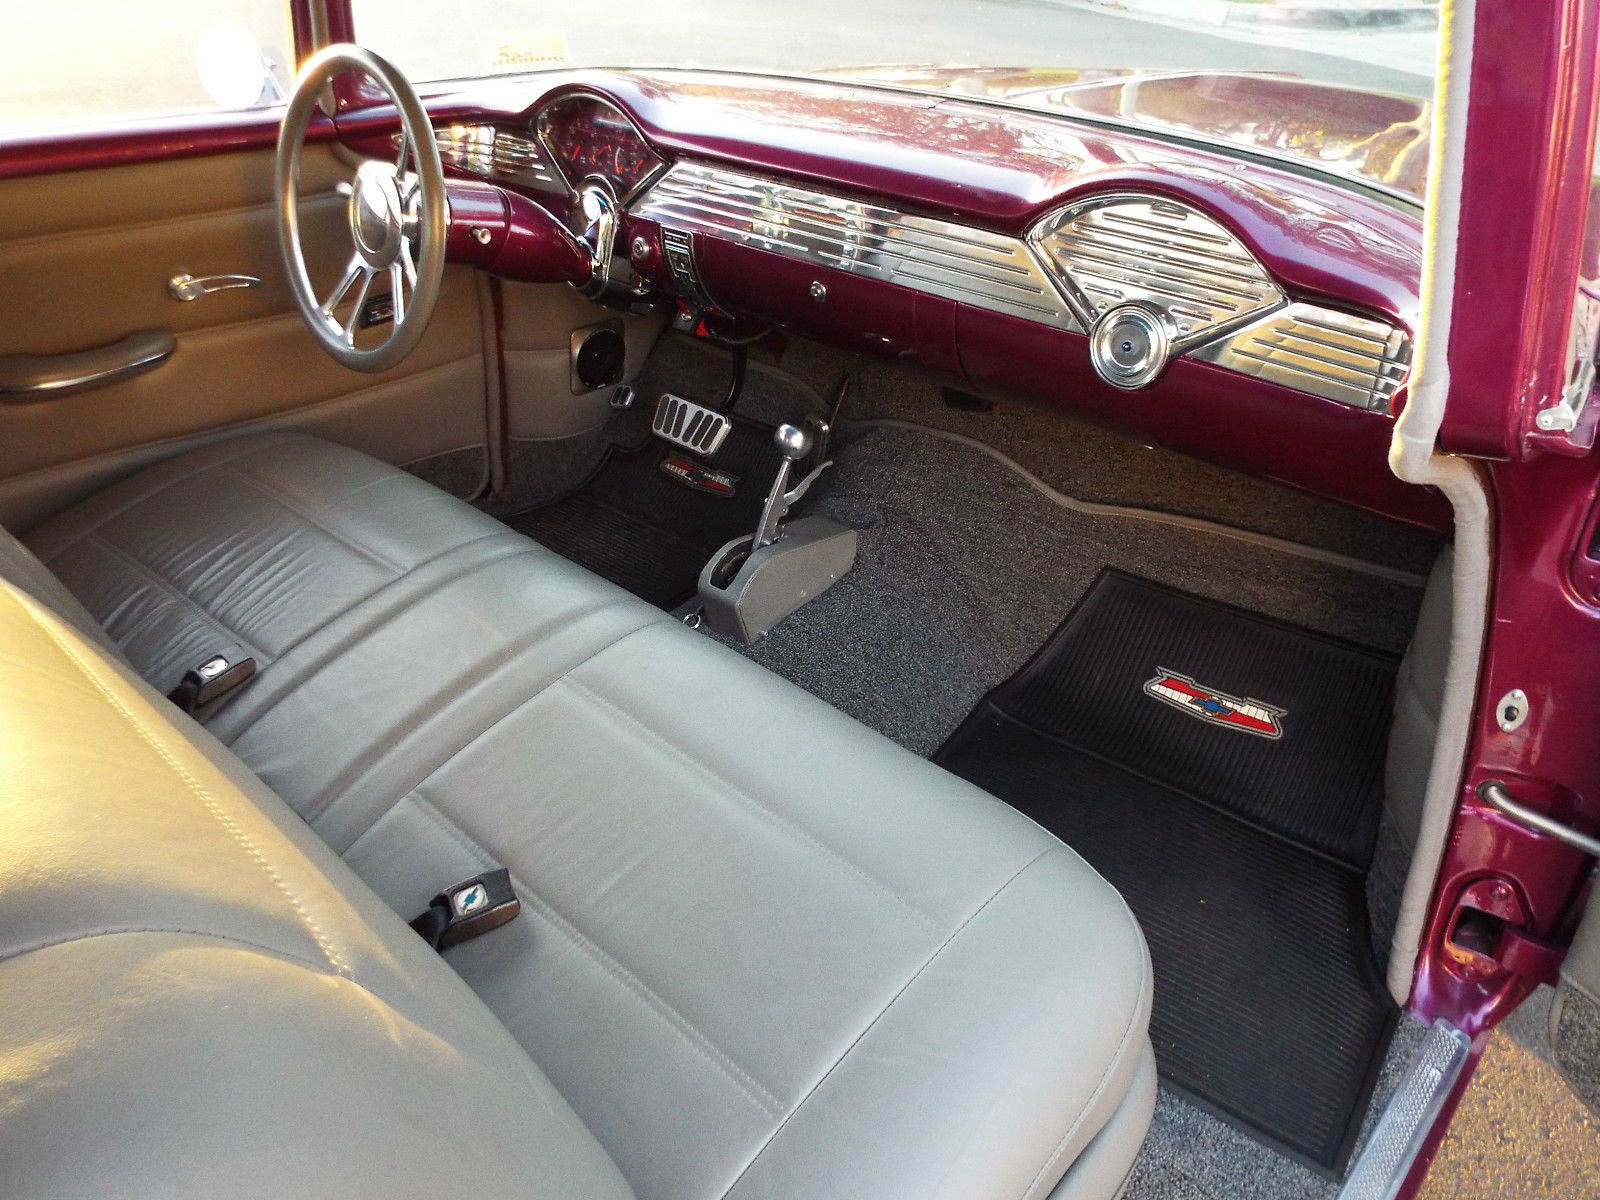 1955 Chevrolet Bel Air 210 Post Hot Rod Classic Chevy Prevnext